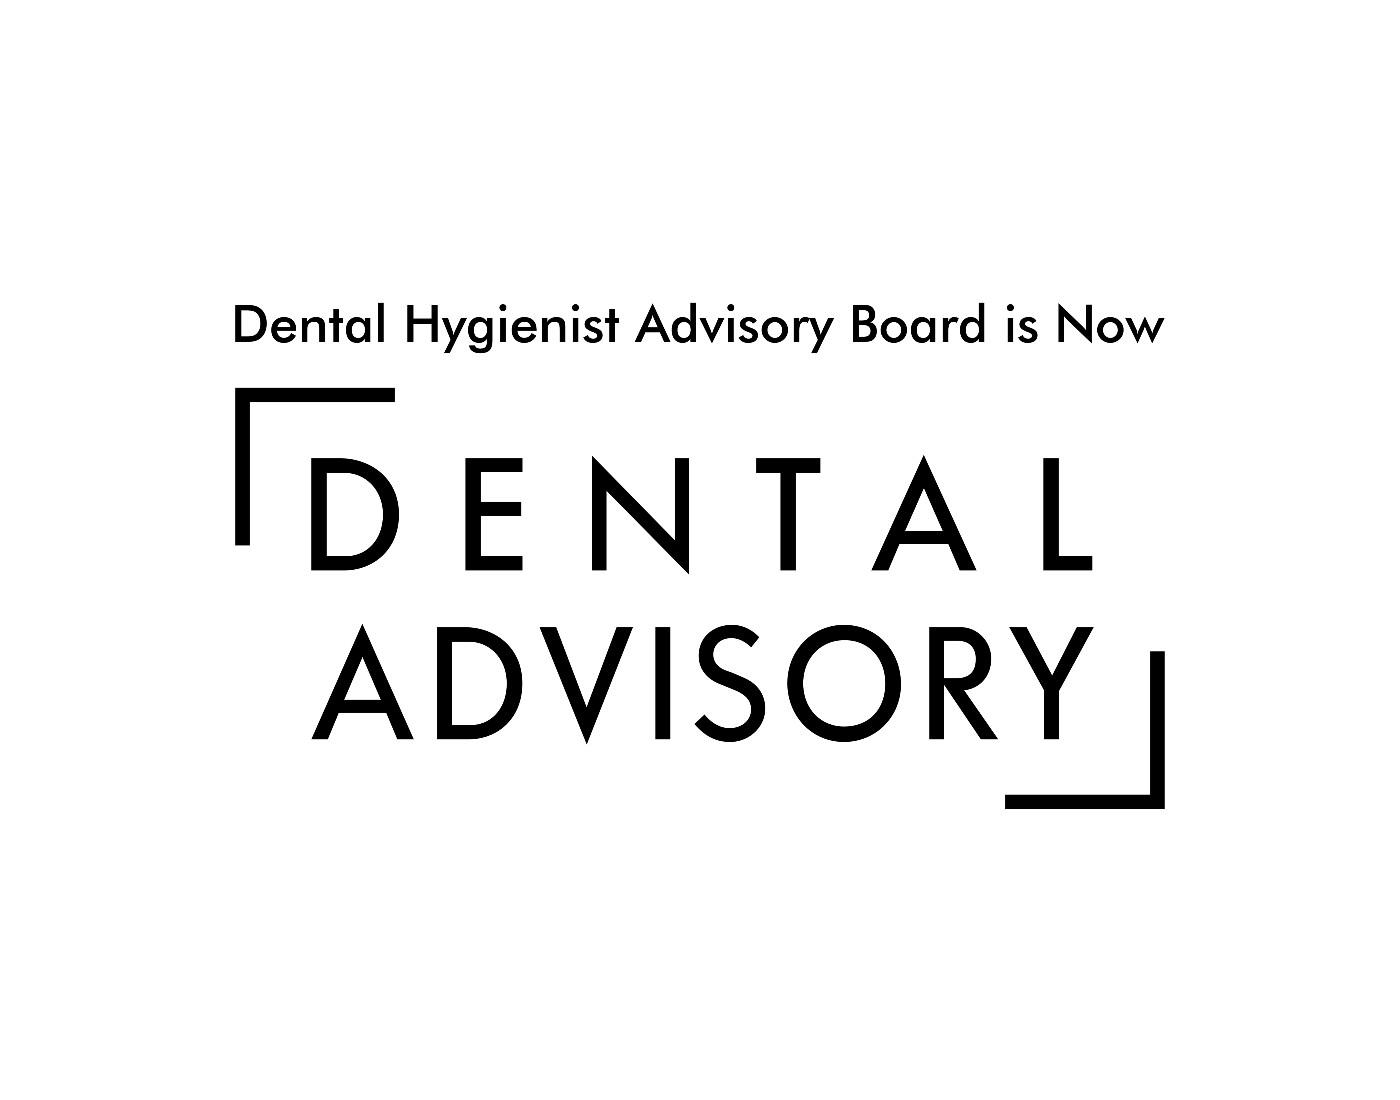 dental-hygienist-advisory-board-logo-new-07-2021-1400x1100px